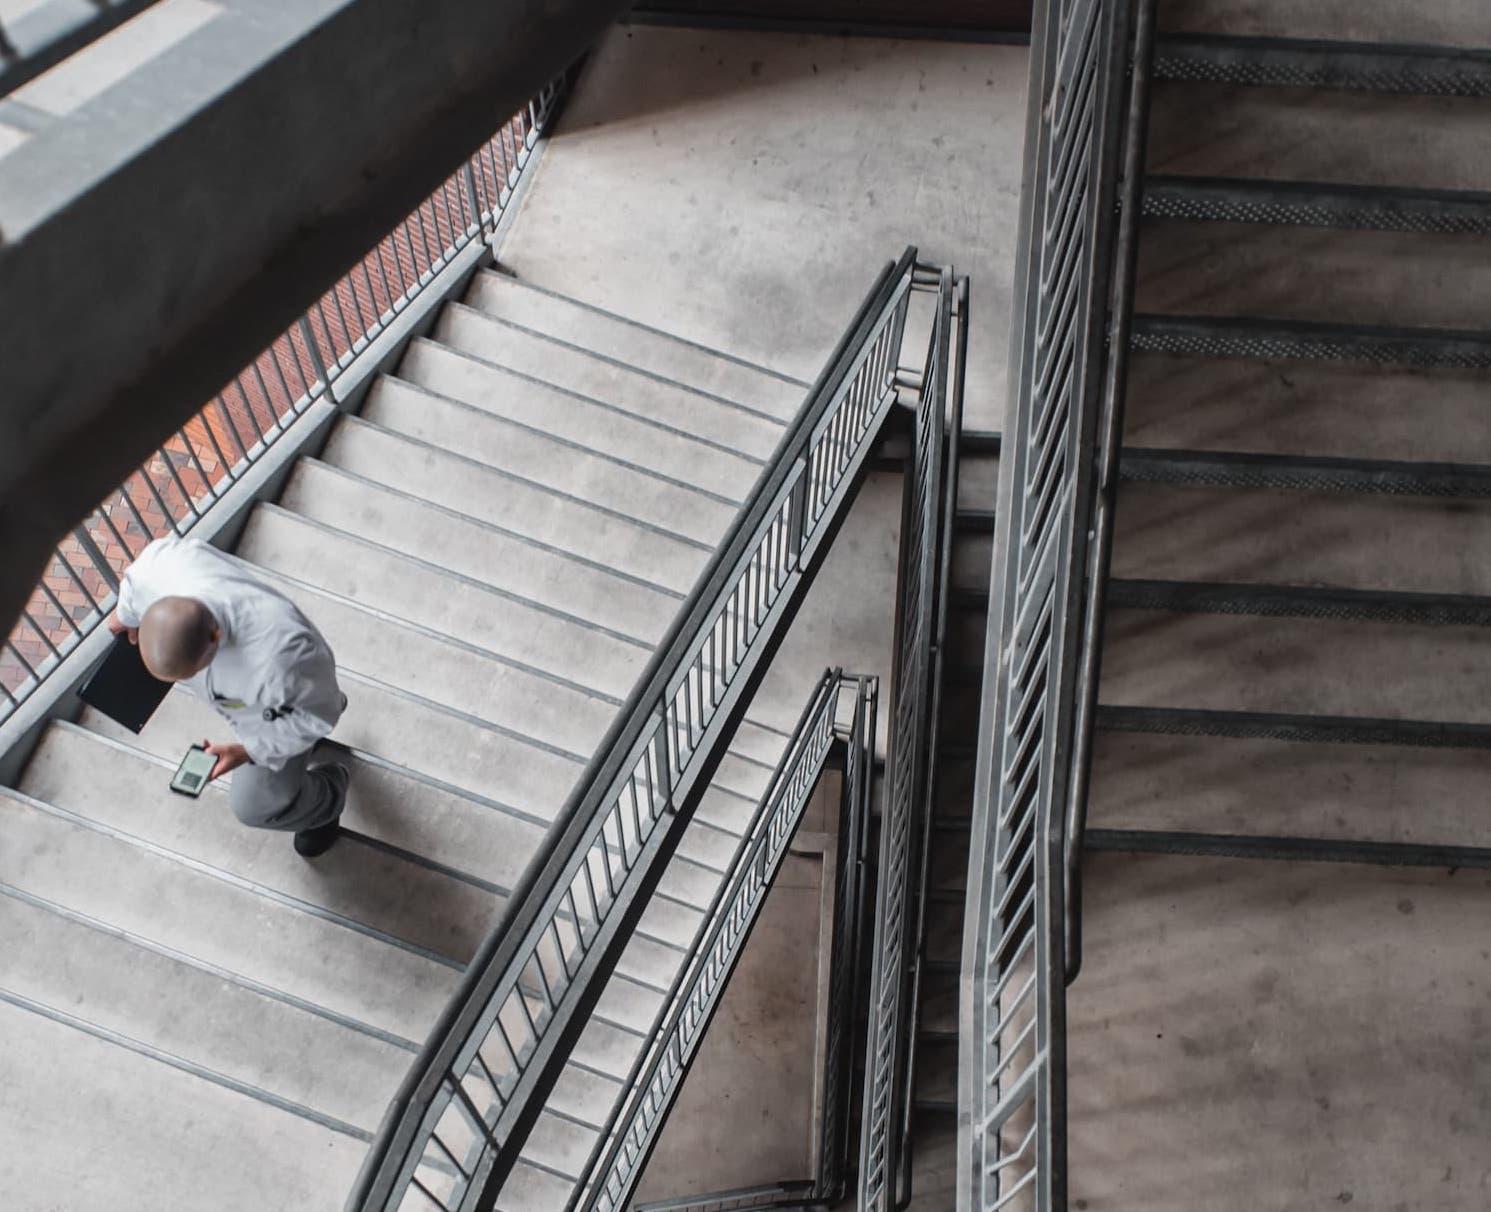 Man on phone walking up stairs